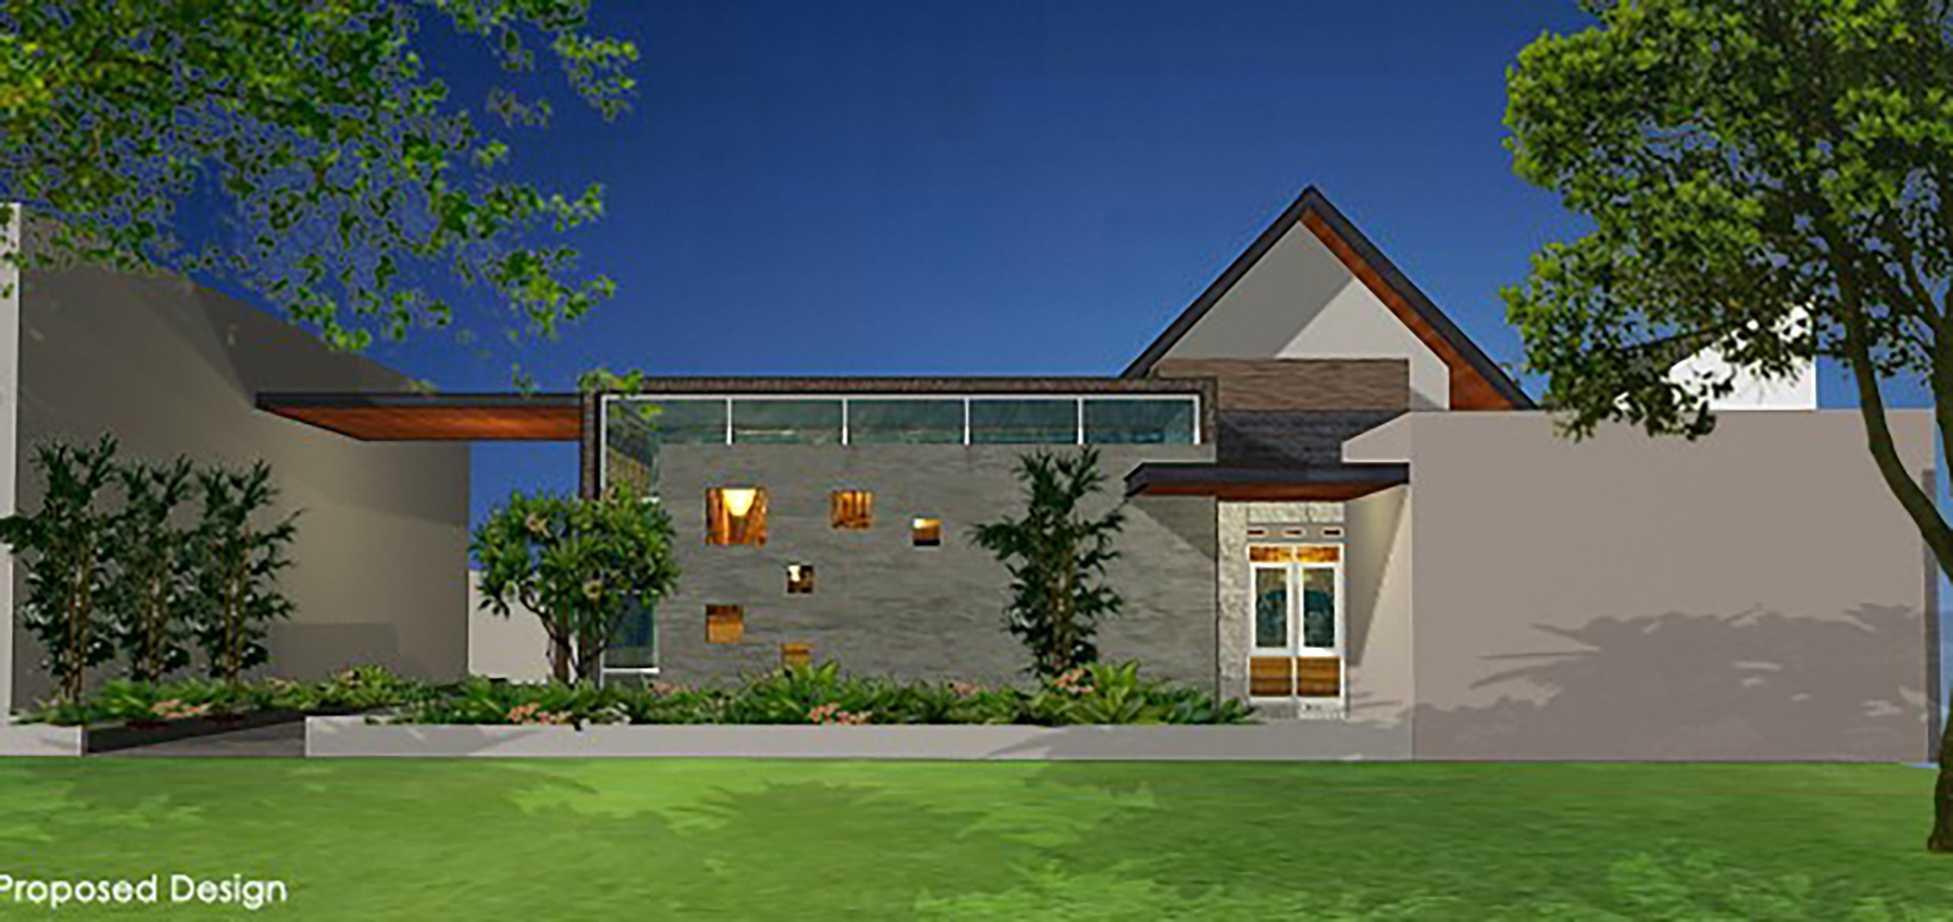 Alfaiz Design D+A House Pucang, Bawang, Banjarnegara, Jawa Tengah, Indonesia Pucang, Bawang, Banjarnegara, Jawa Tengah, Indonesia Alfaiz-Design-Da-House  100541